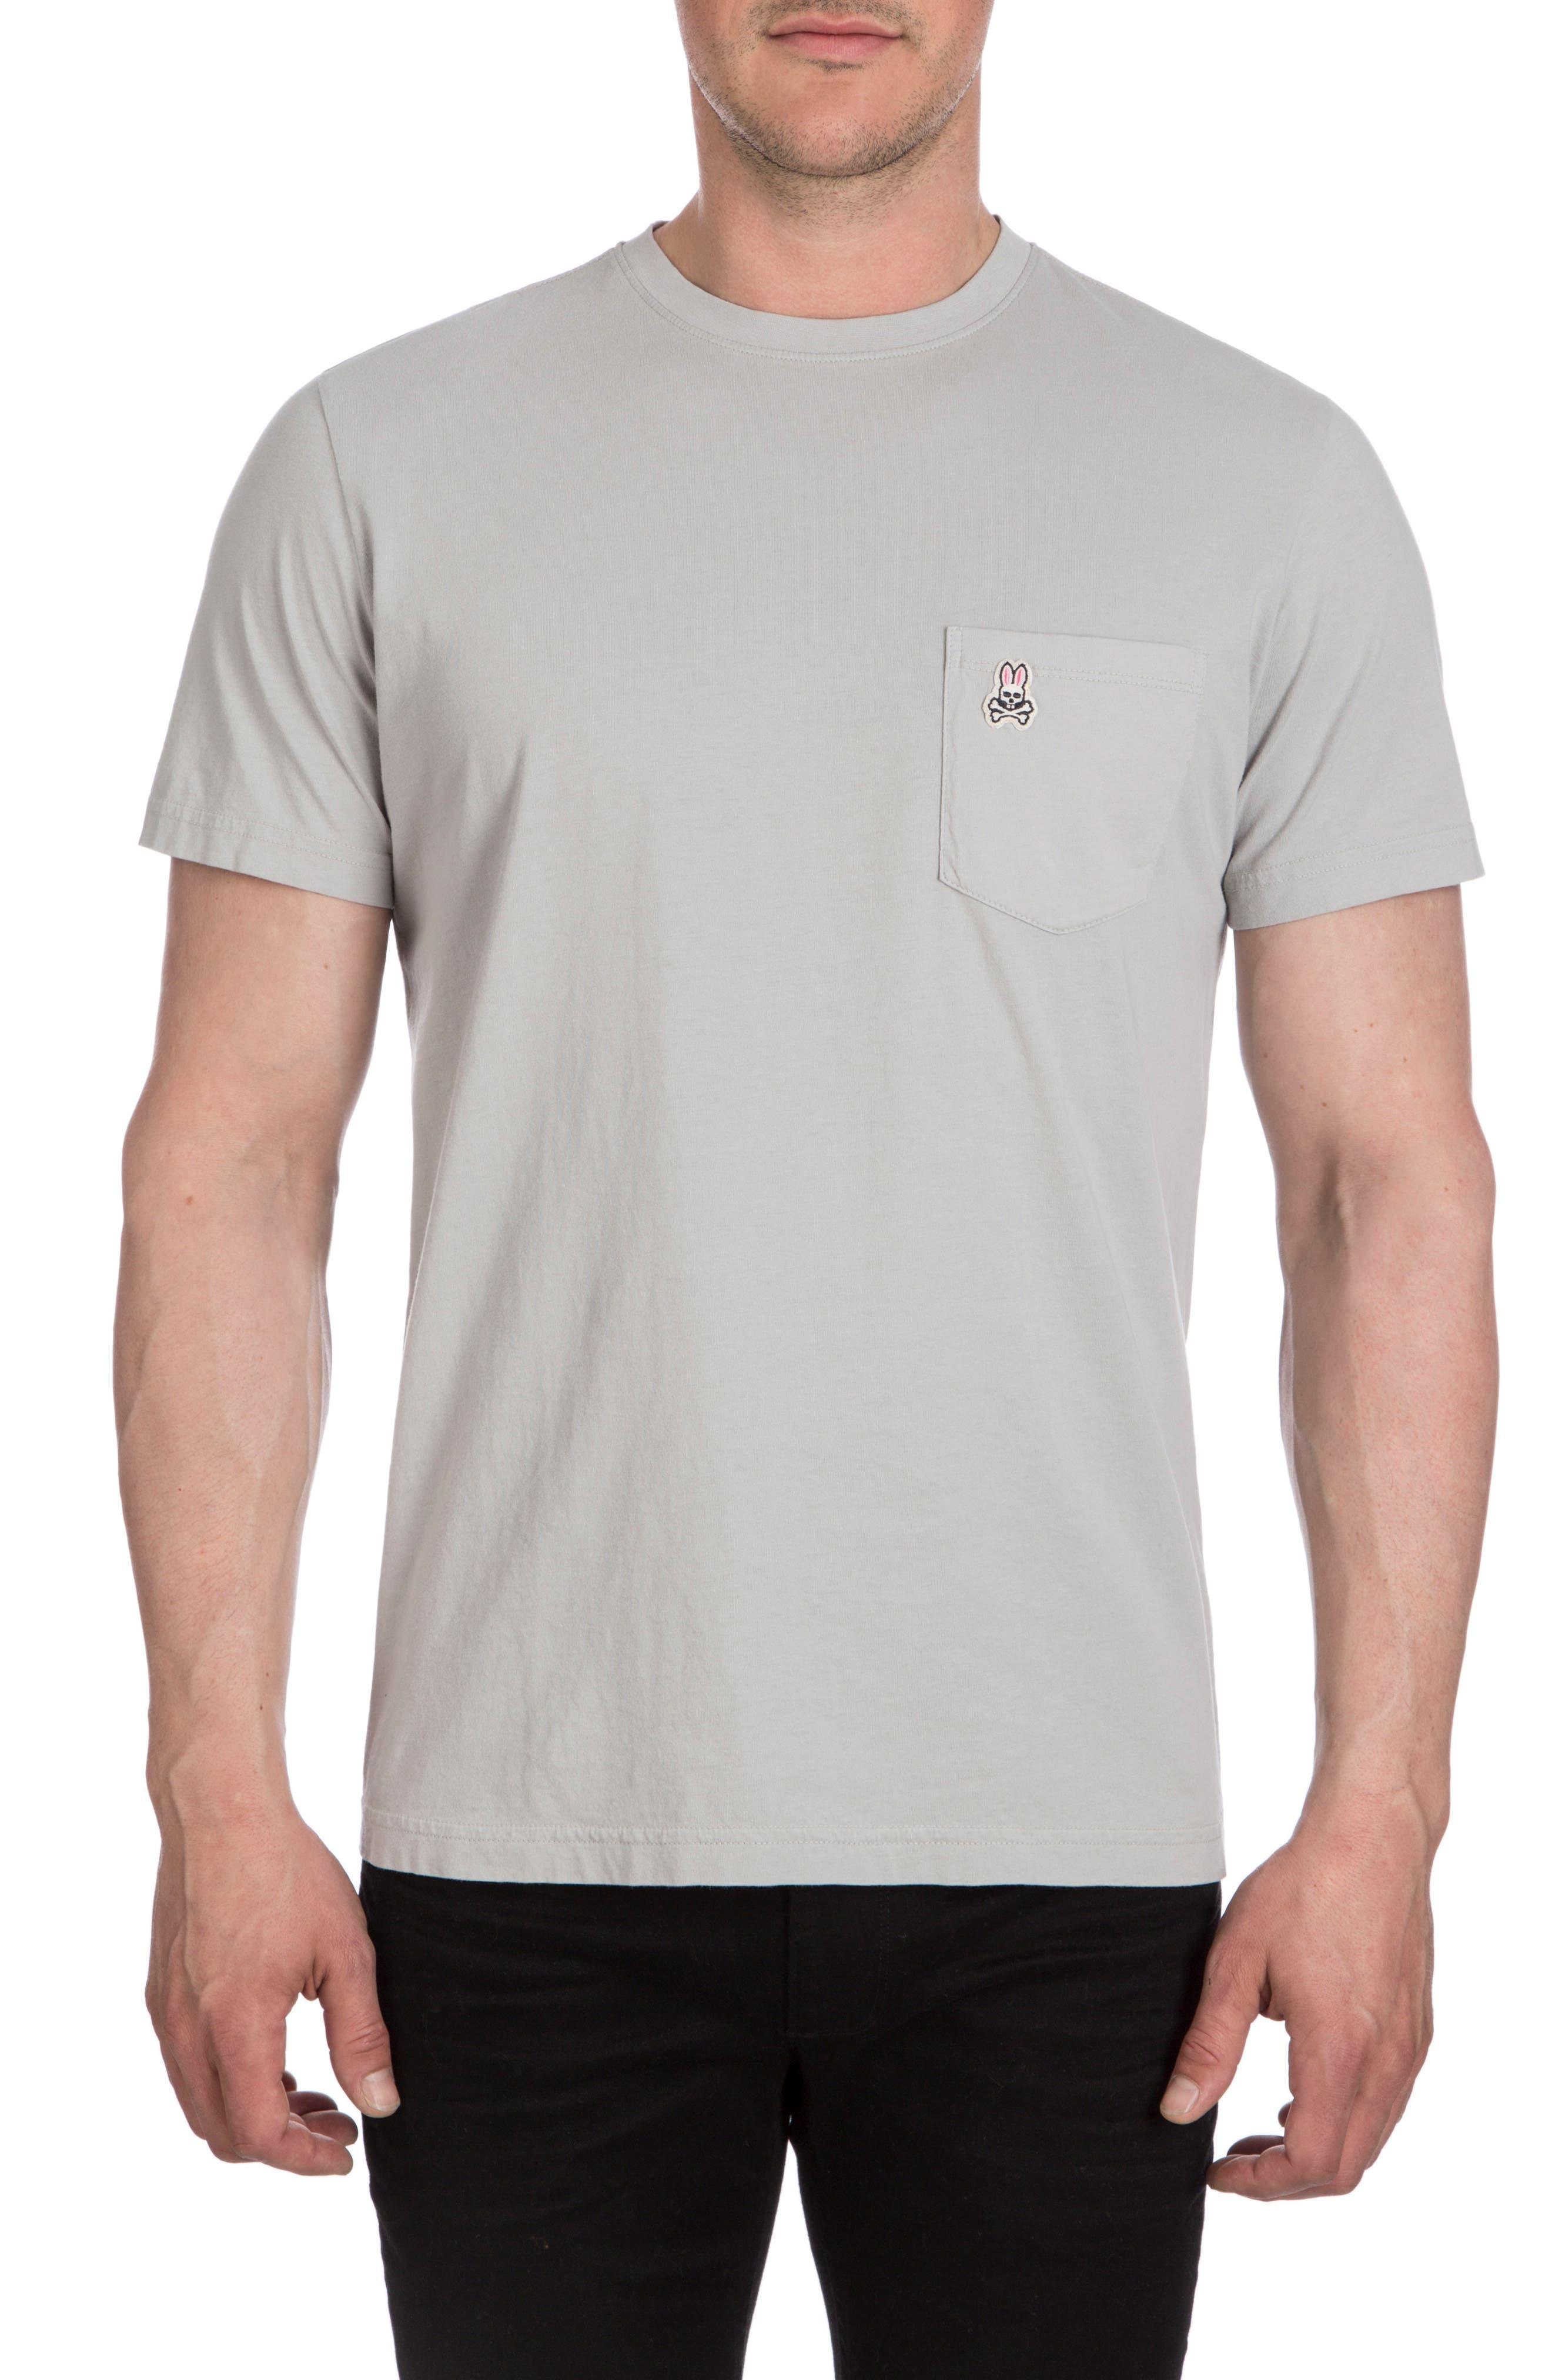 Main Image - Psycho Bunny Langford Garment Dye T-Shirt